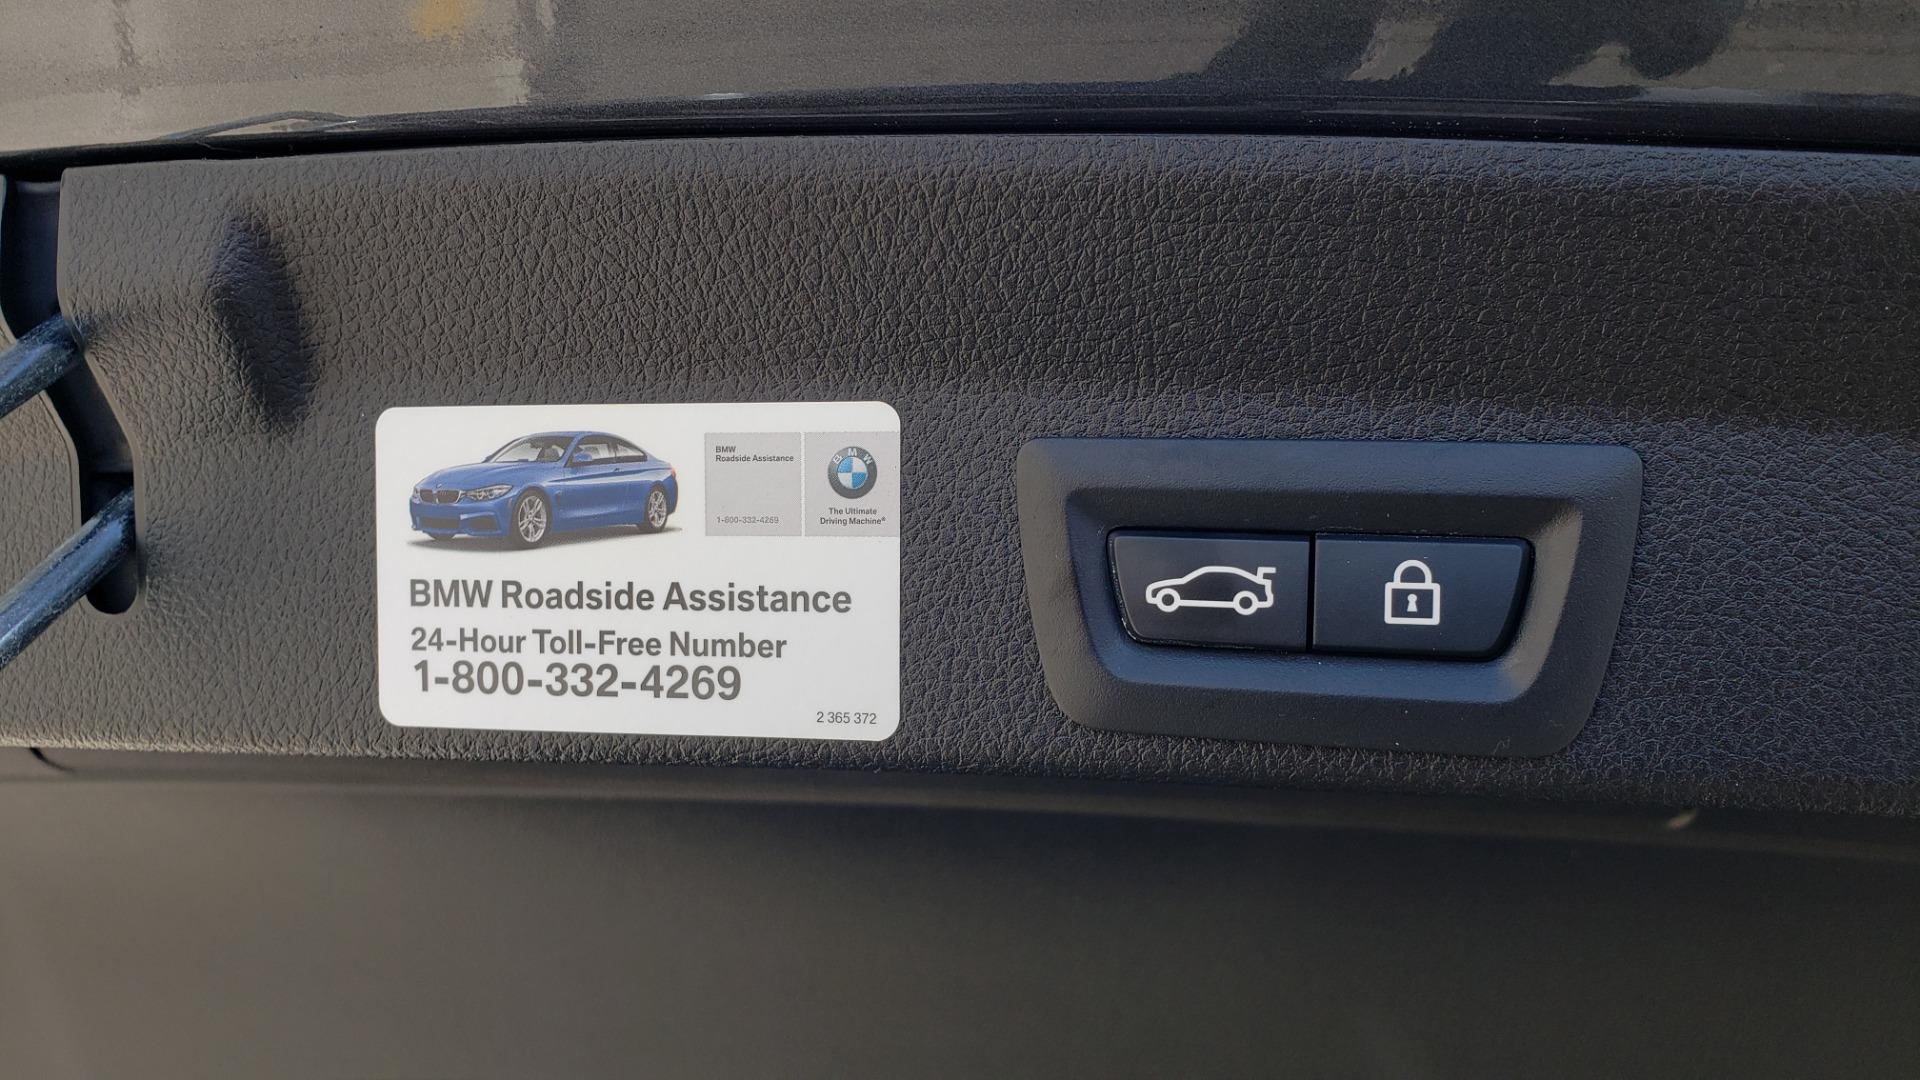 Used 2018 BMW 4 SERIES 430IXDRIVE / PREMIUM / NAV / SUNROOF / ESSENTIALS PKG for sale $29,495 at Formula Imports in Charlotte NC 28227 21